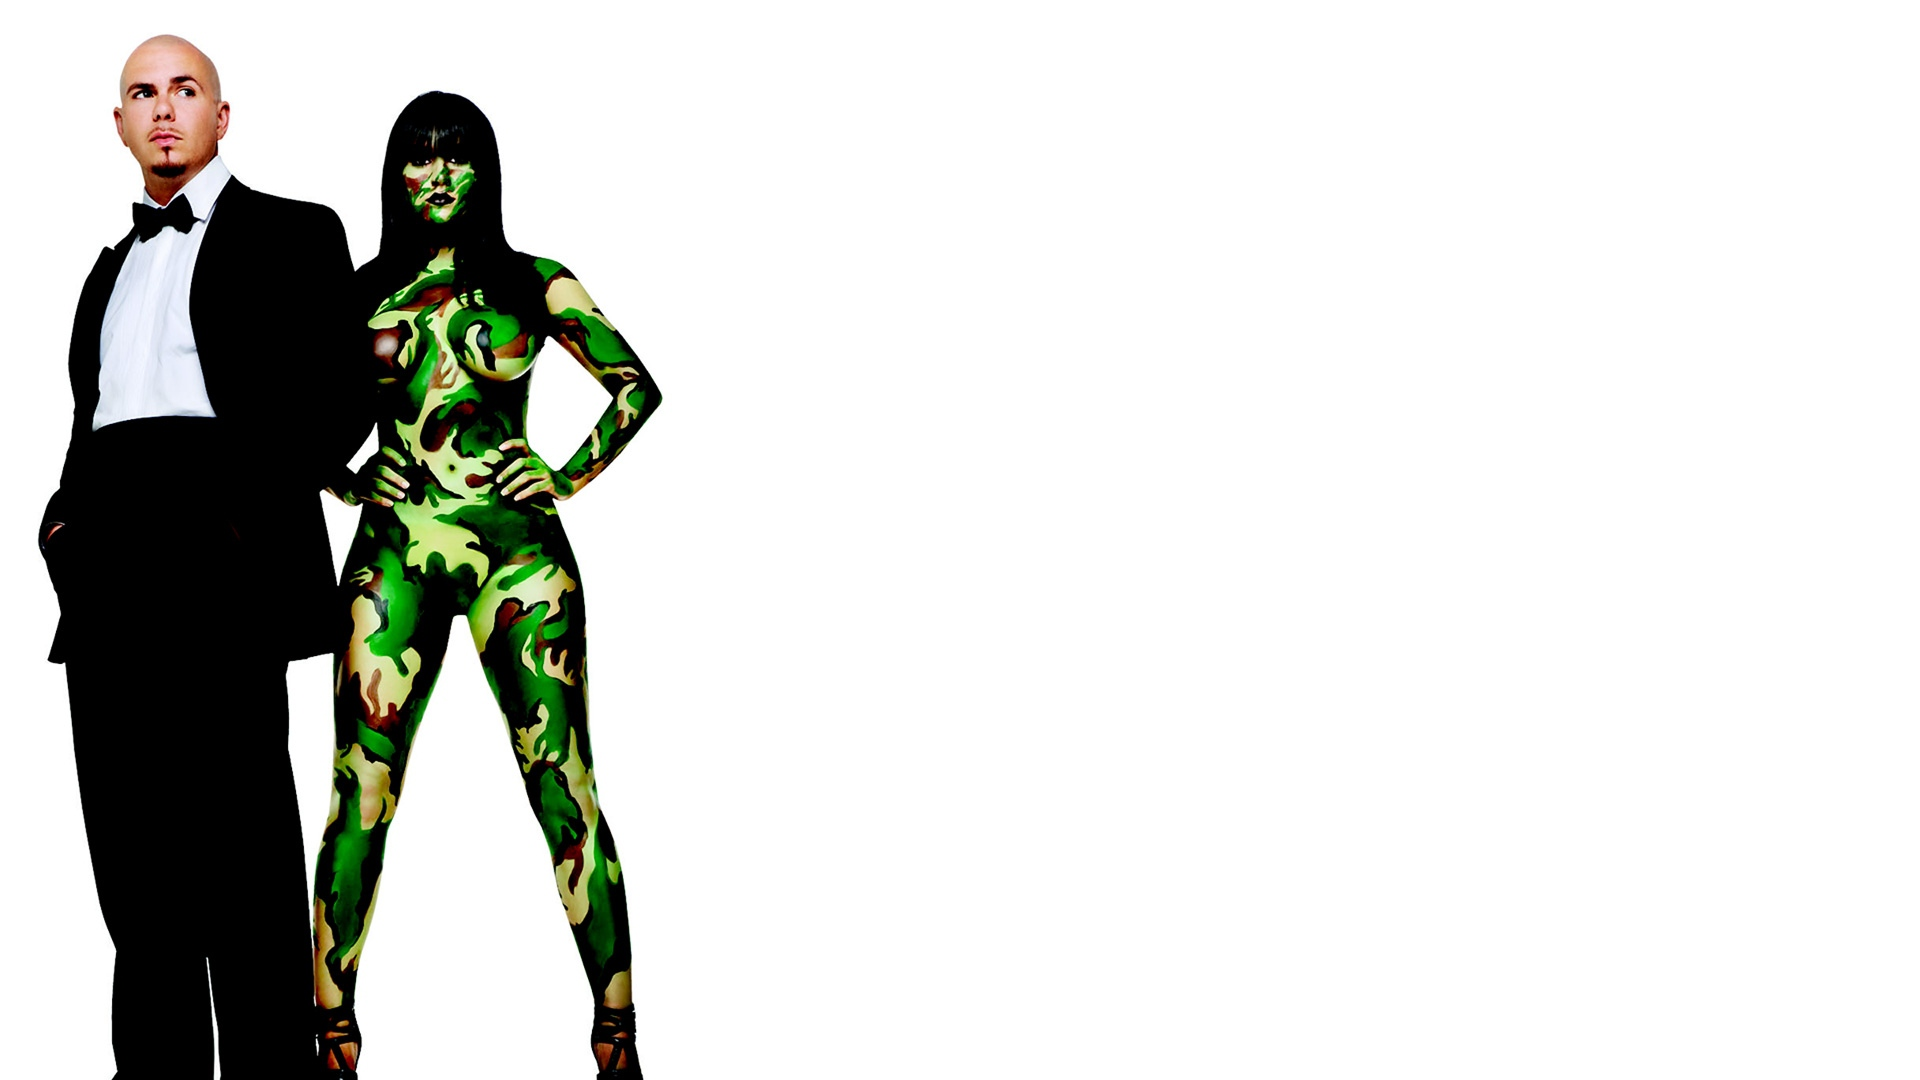 Download Wallpaper 1920x1080 pitbull, girl, body art, suit